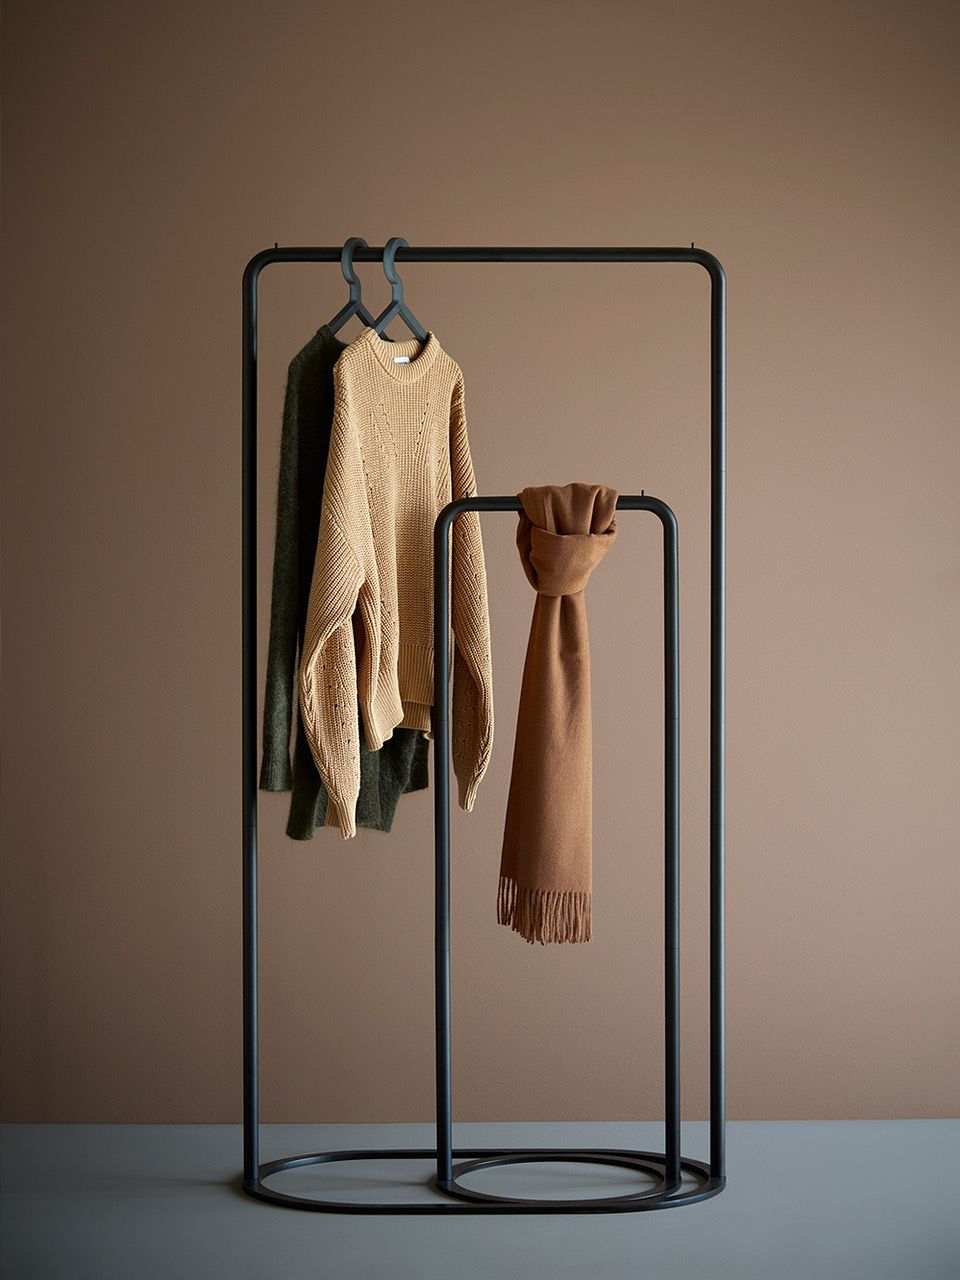 Woud O&O clothes racks